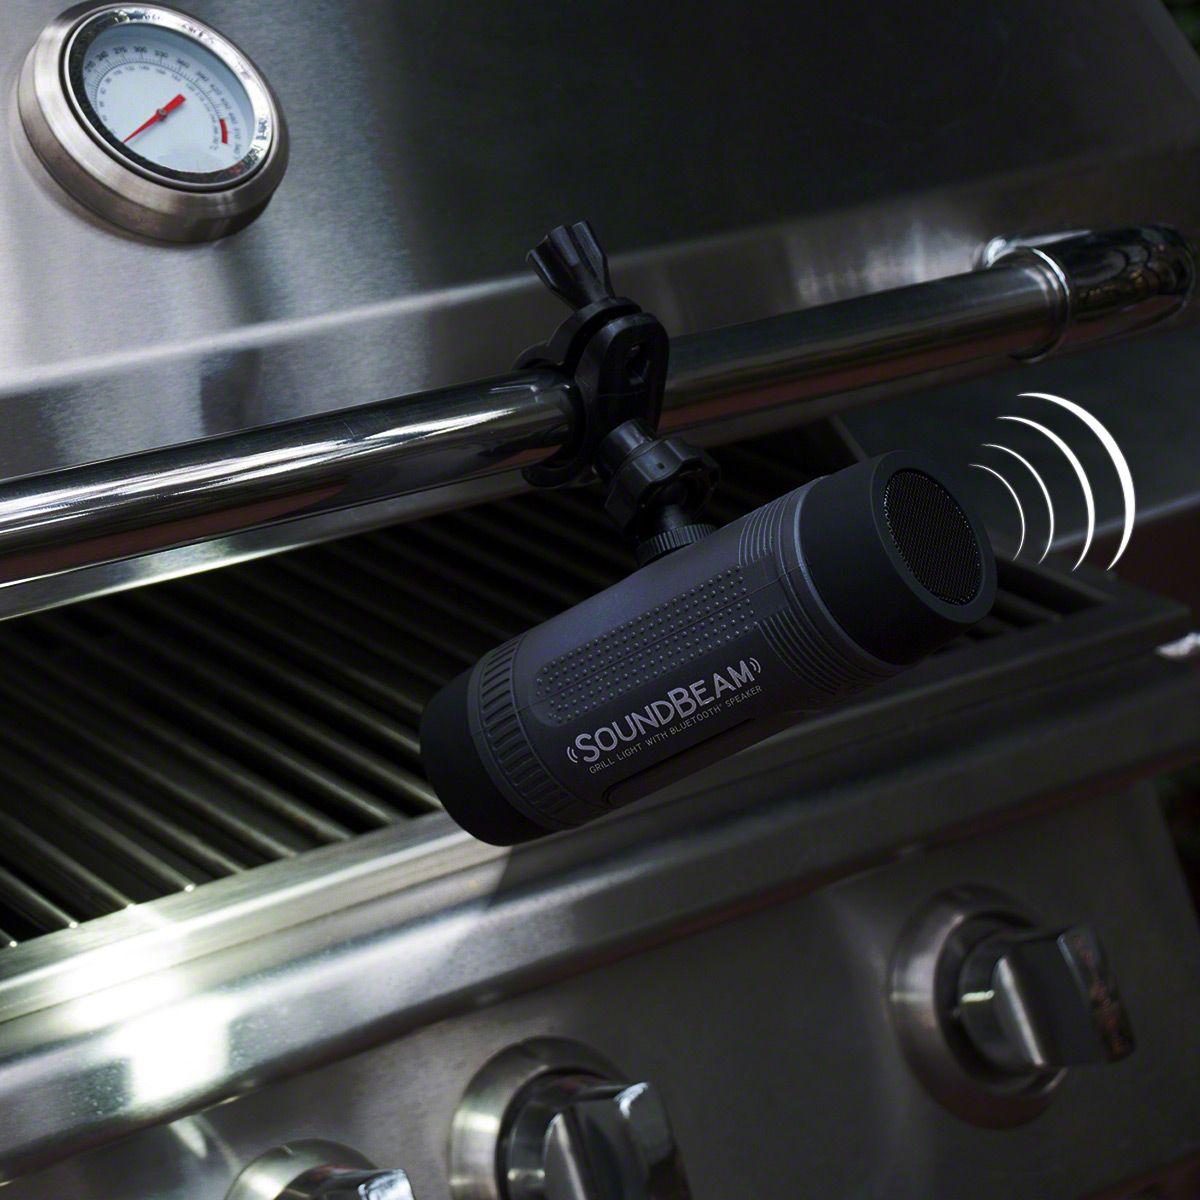 SoundBeam Outdoor BBQ Light with Bluetooth Speaker